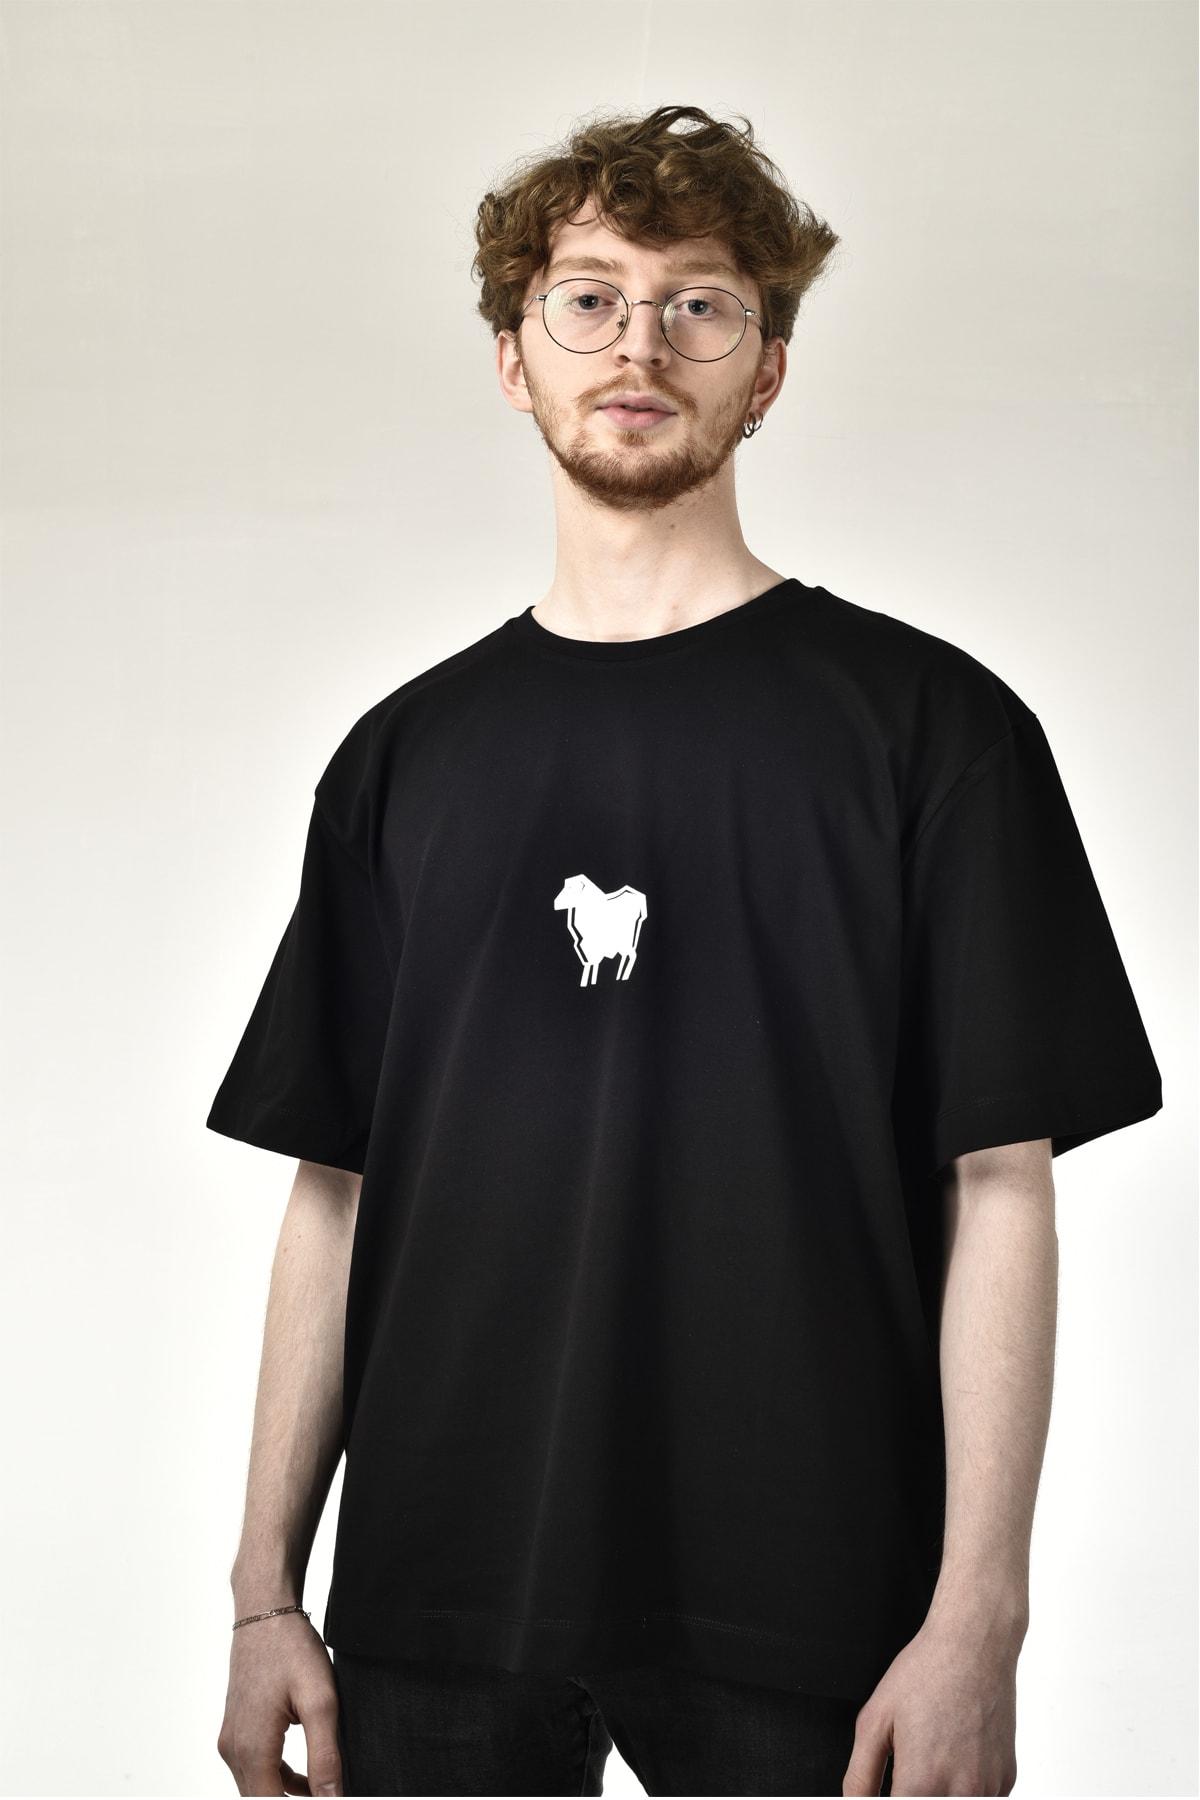 Unısex Siyah Baskılı Geniş Kalıp T-shirt